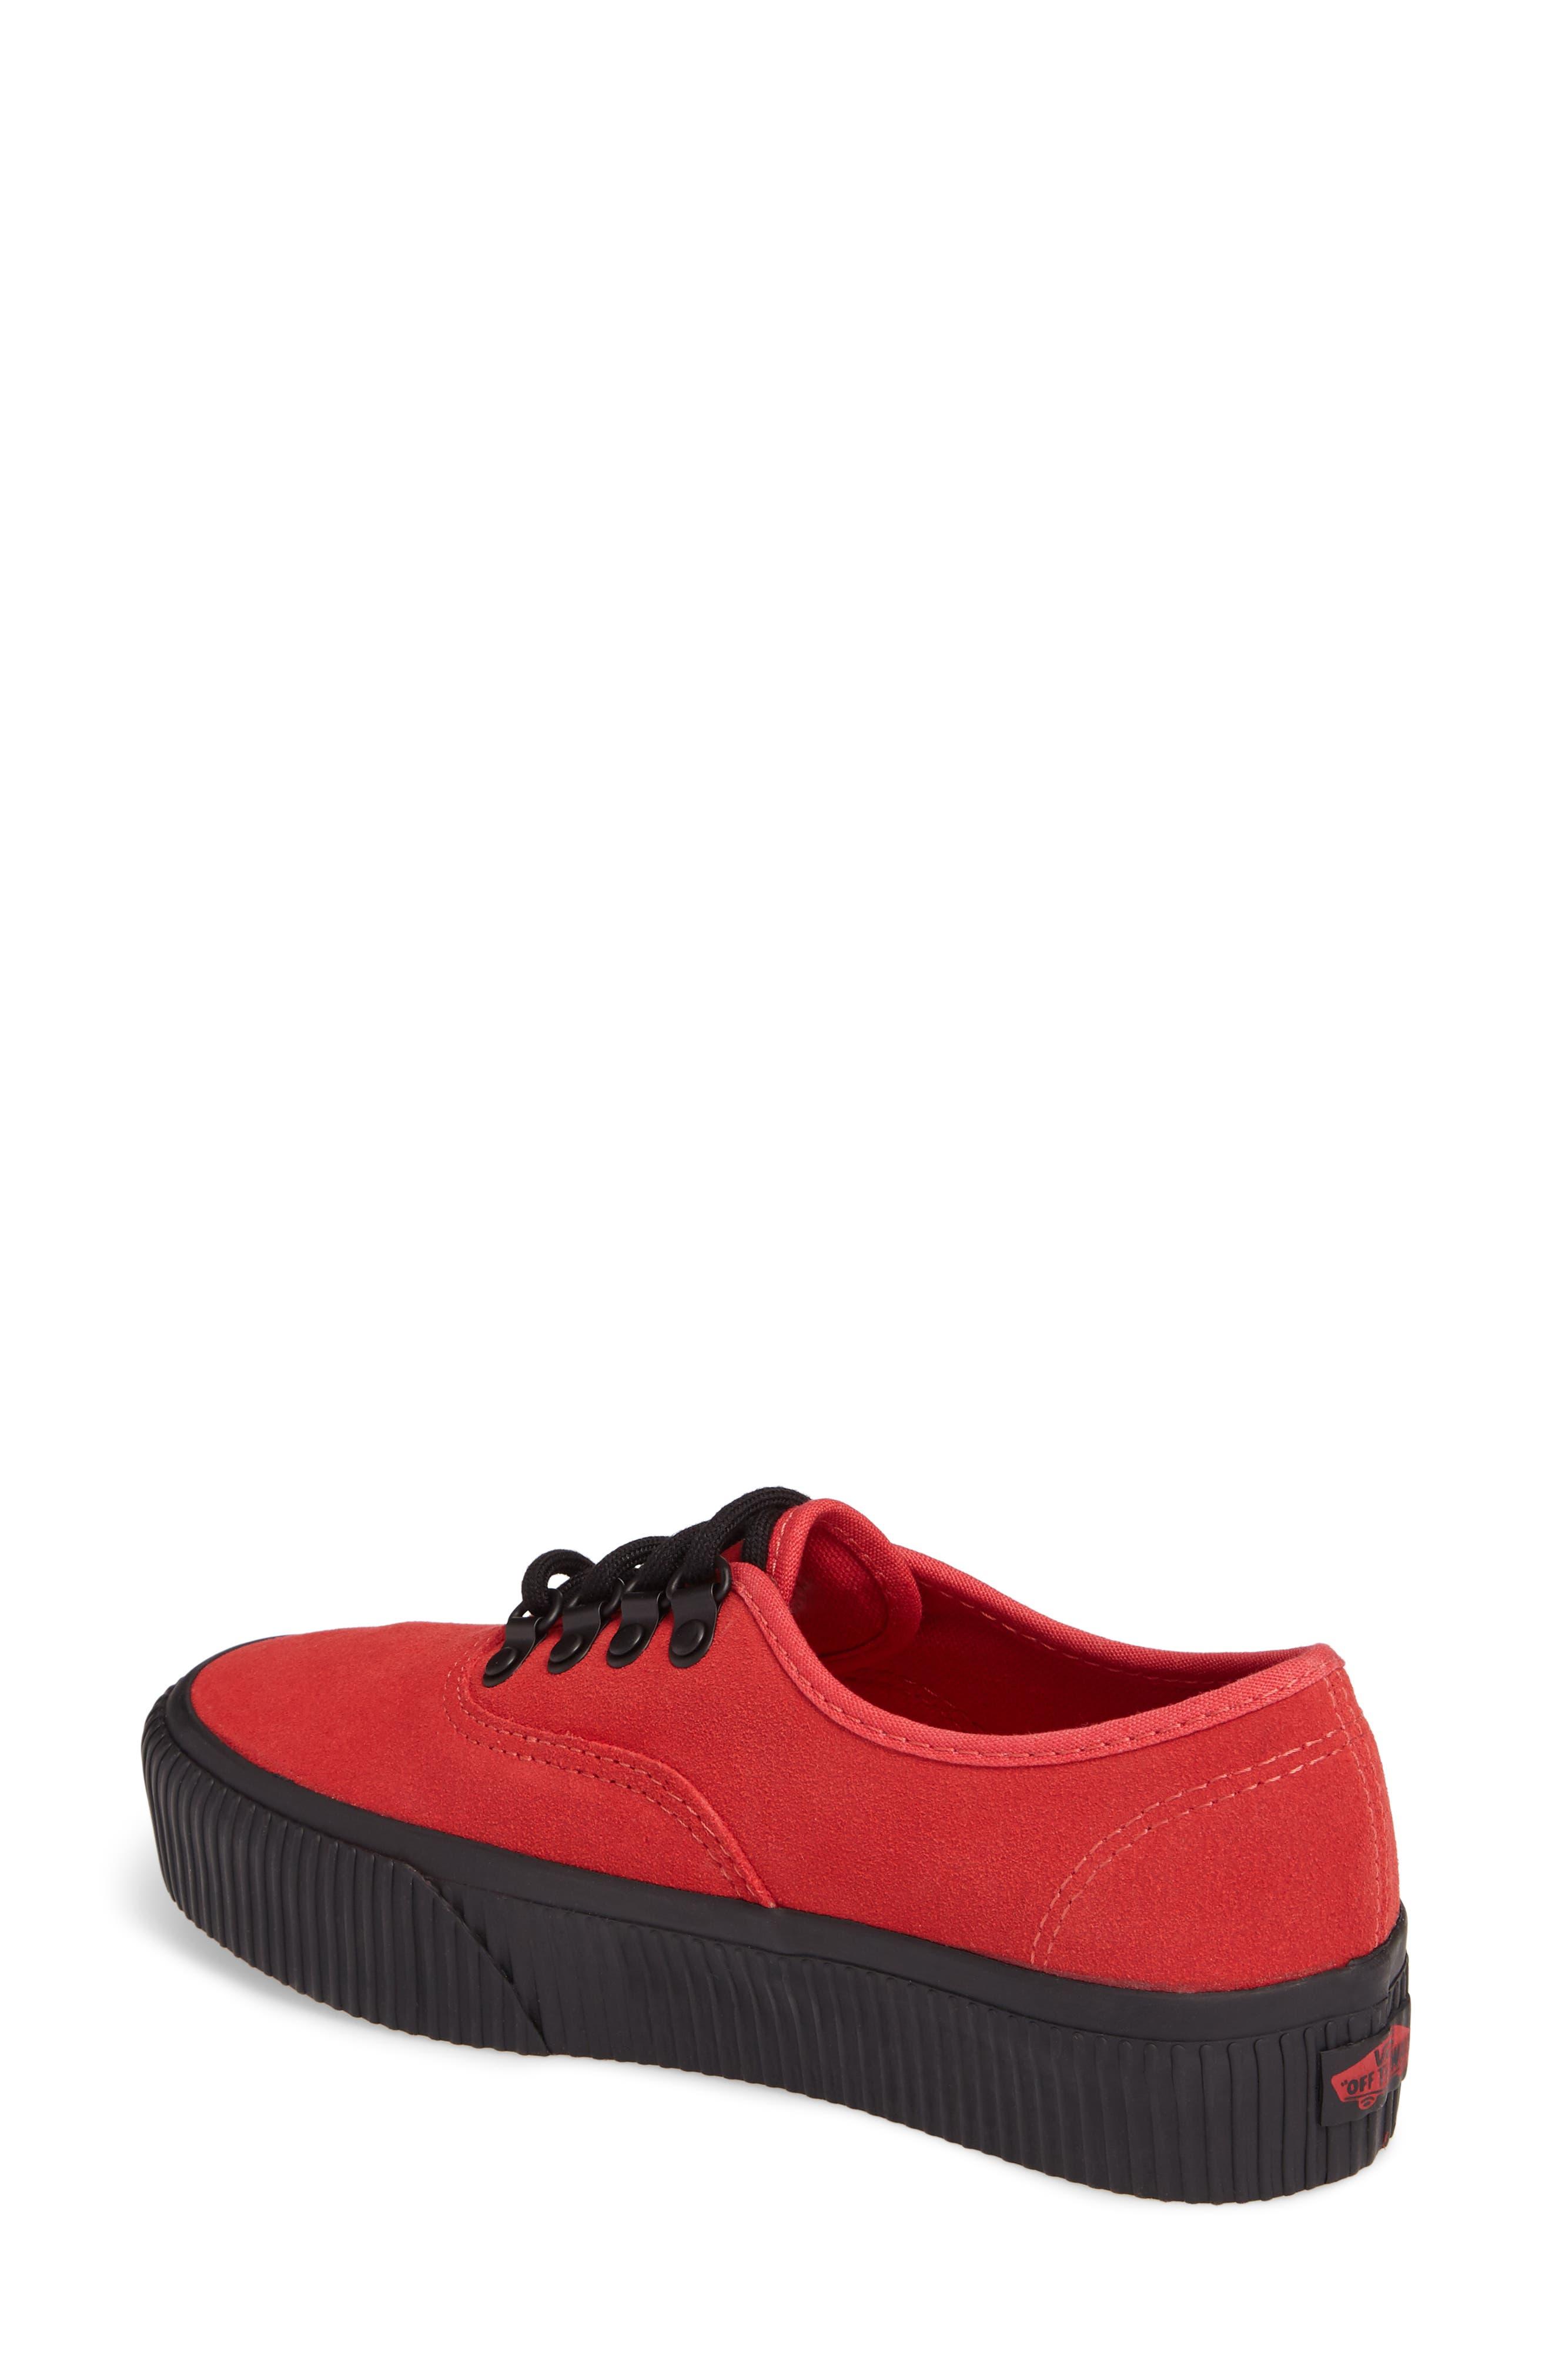 Alternate Image 2  - Vans Authentic 2.0 Platform Sneaker (Women)